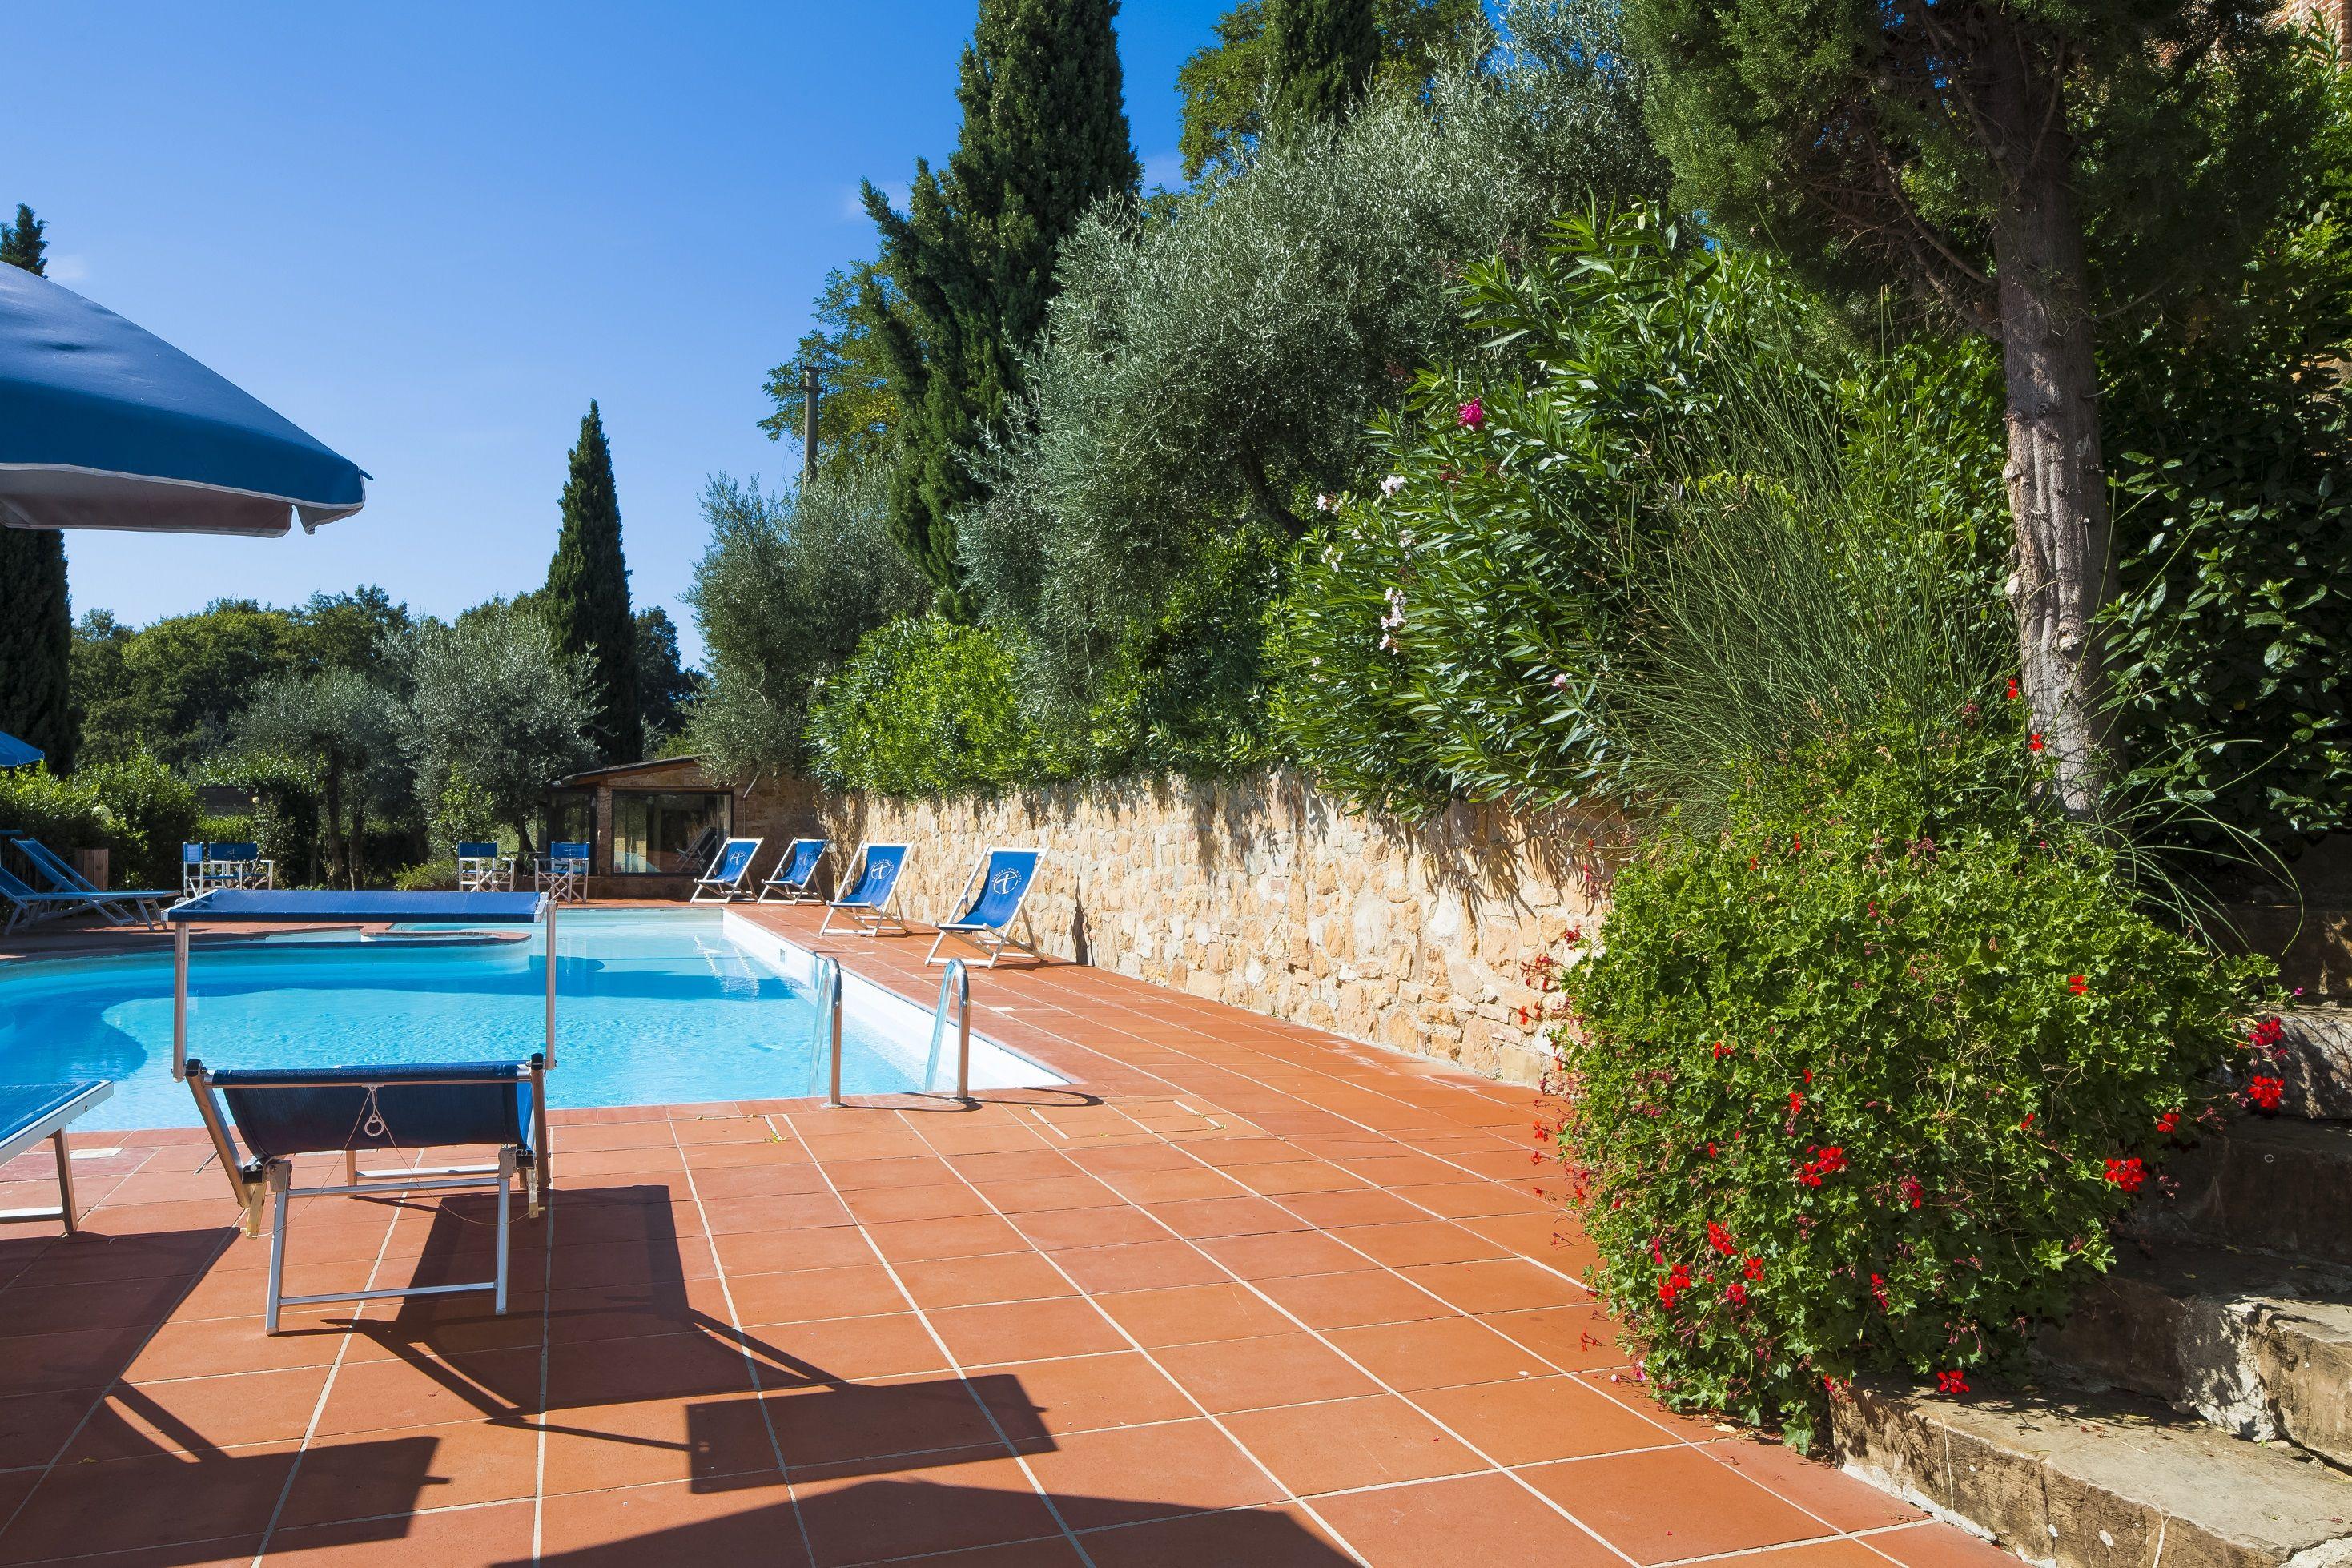 Agriturismo Il Sapito - Corelli Holiday Home photo 15998890